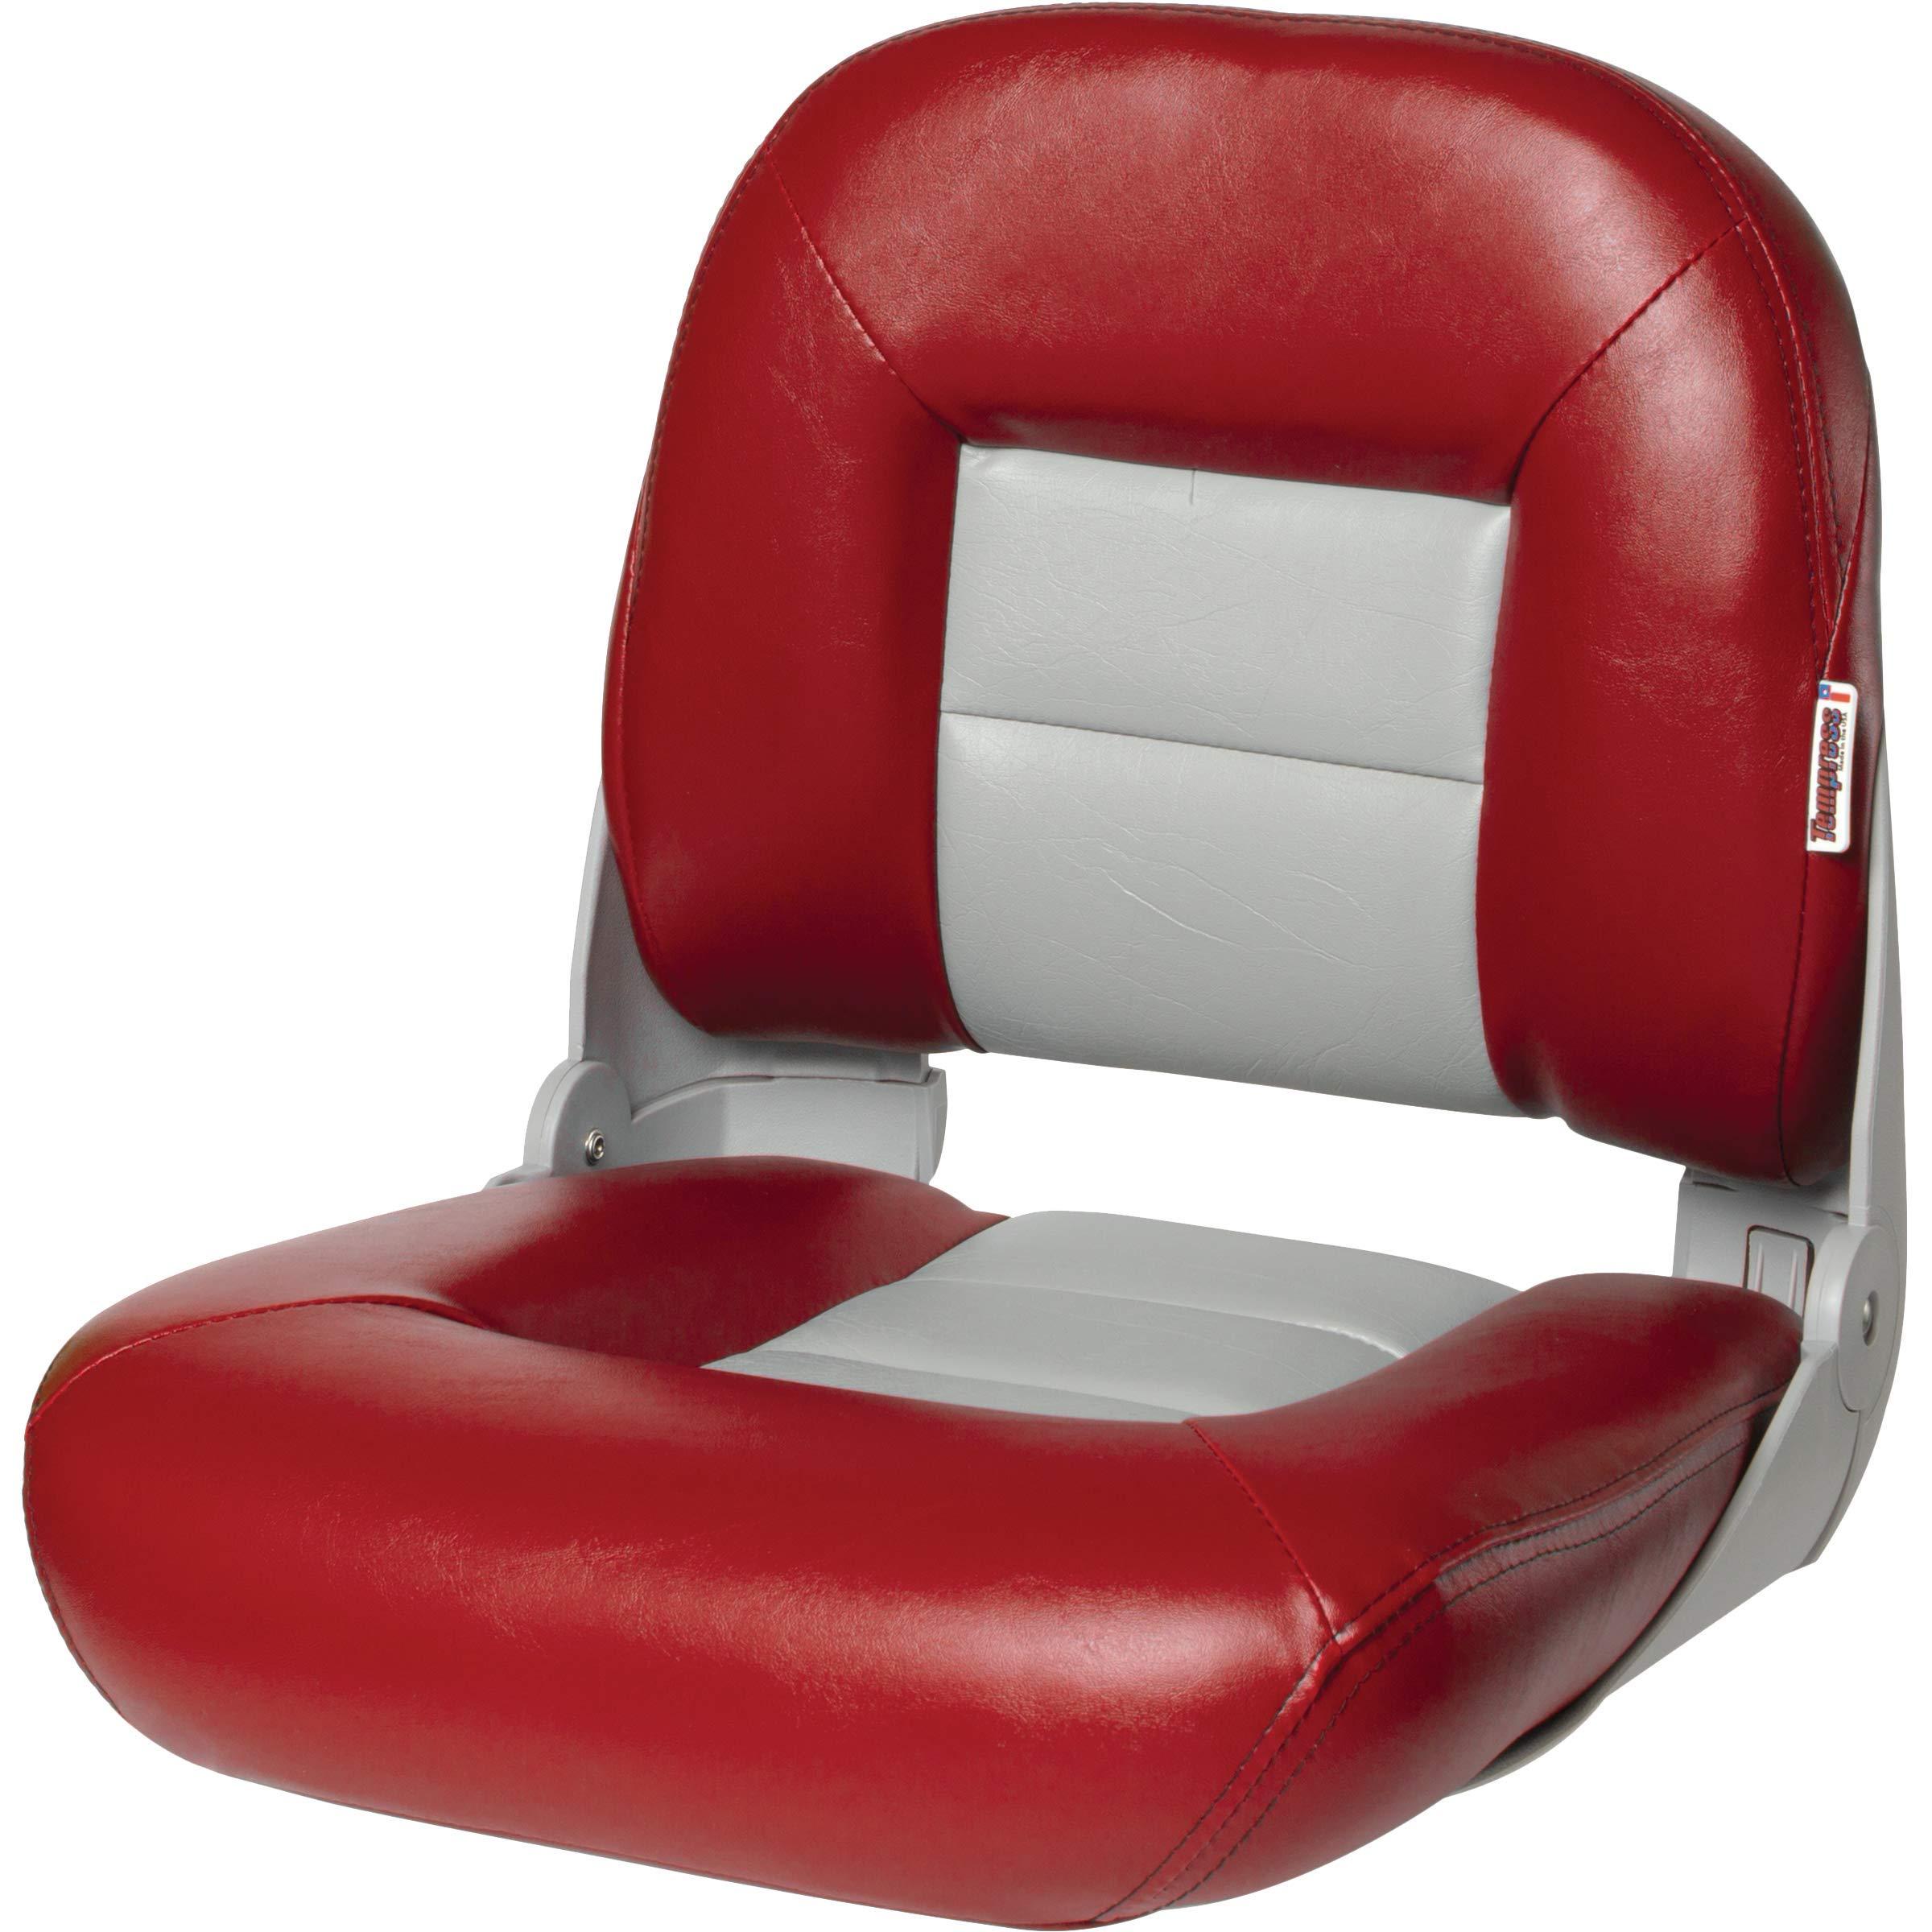 Tempress 54683 Boat Seat Navistyle Low Back by Tempress